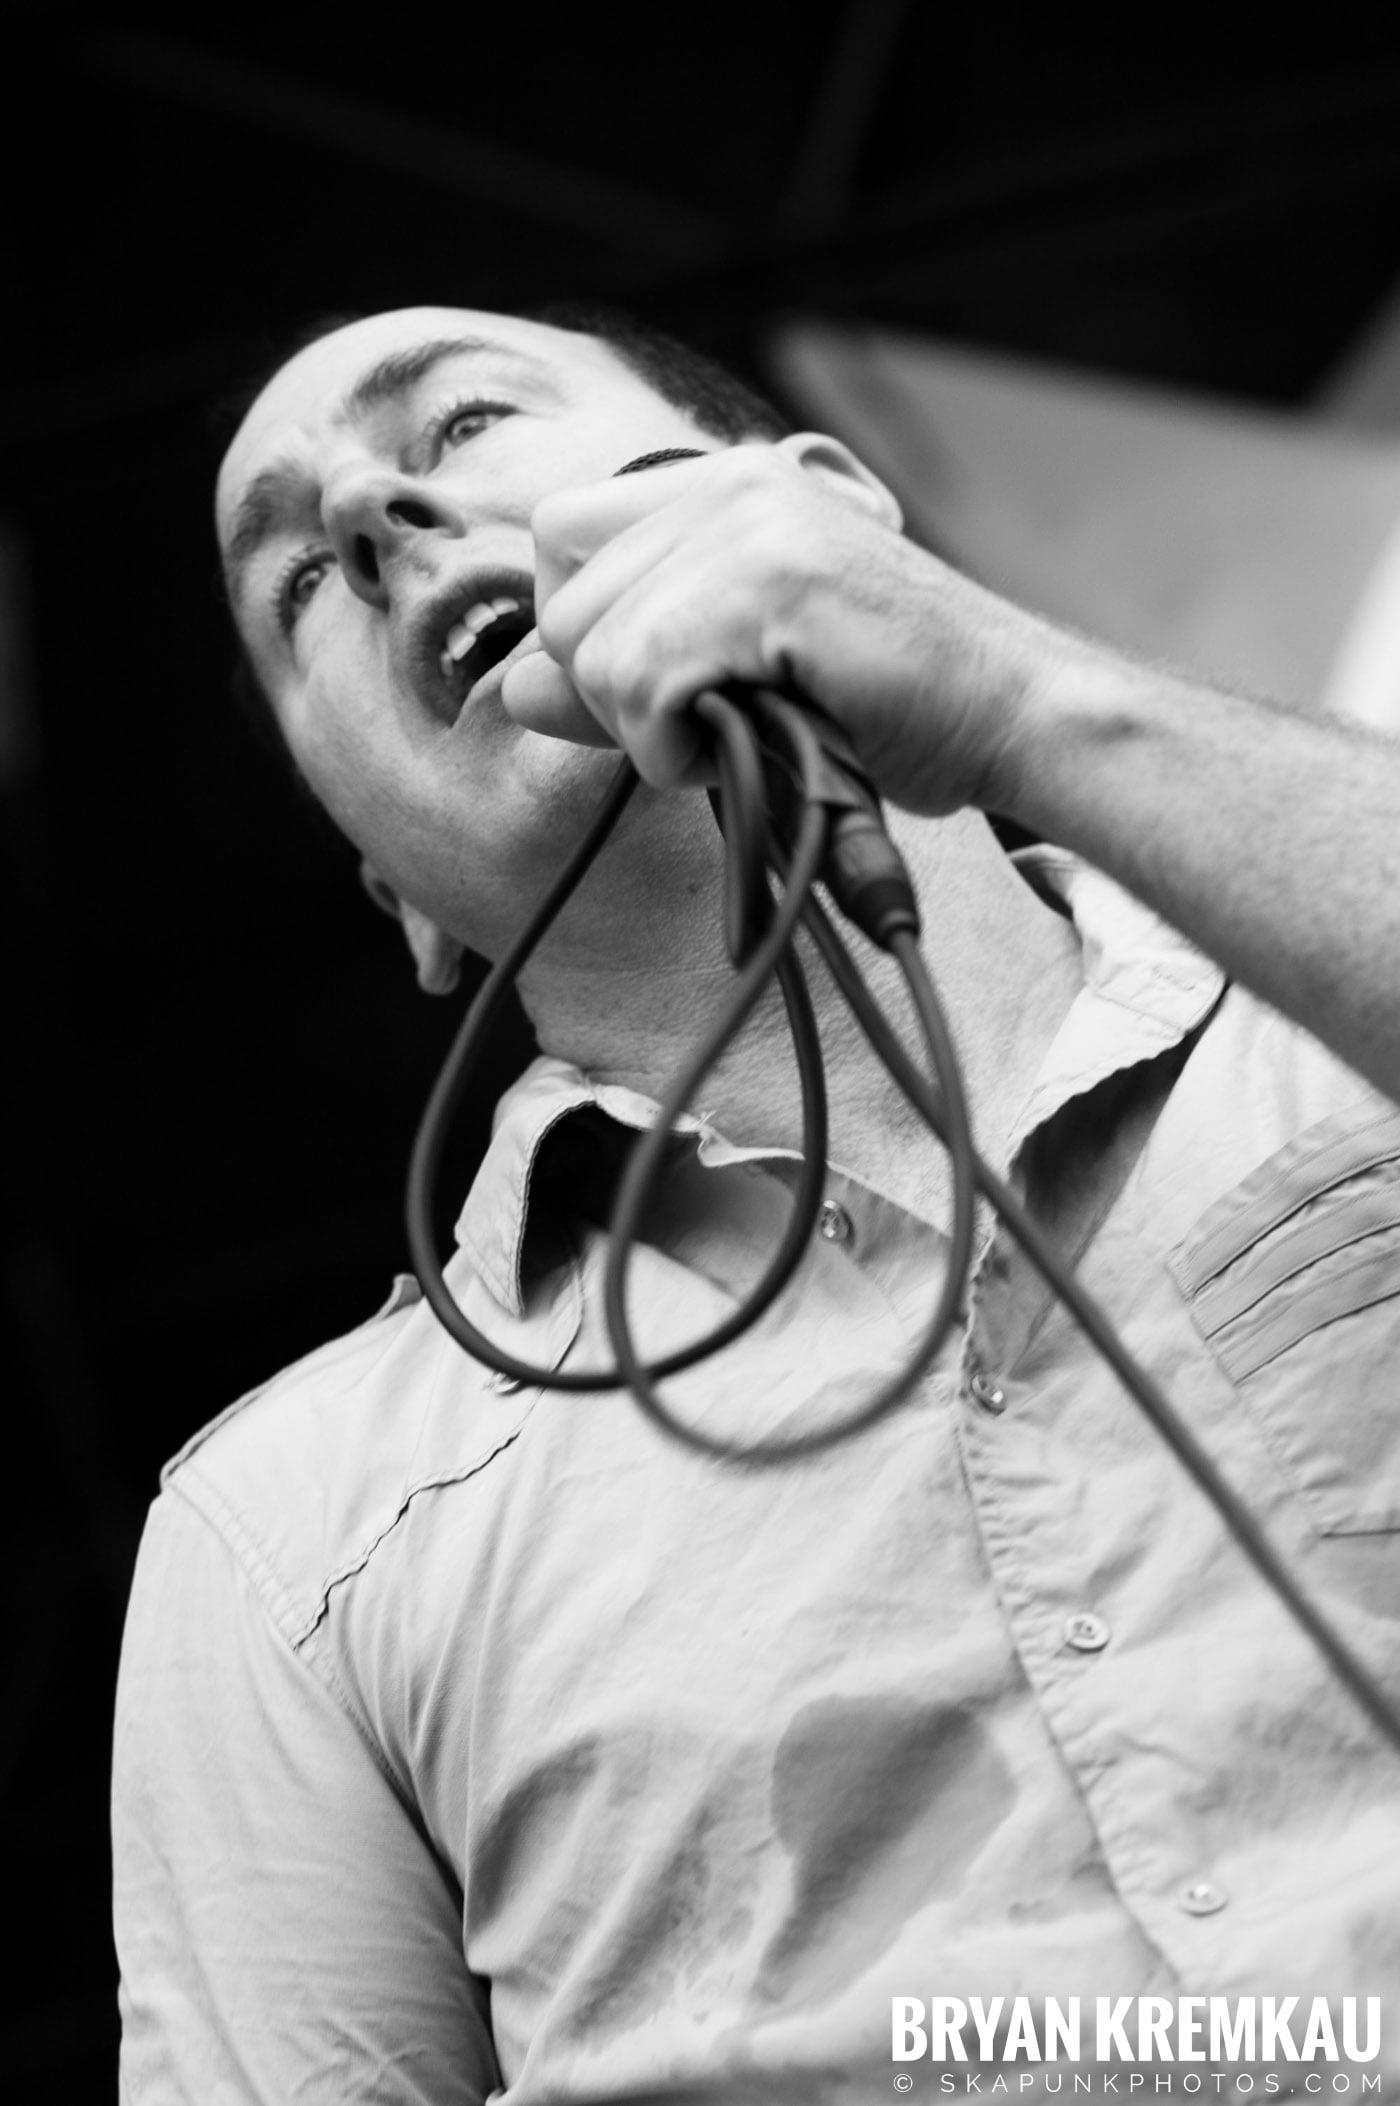 Bad Religion @ Warped Tour 2007, Scranton PA - 7.26.07 (3)